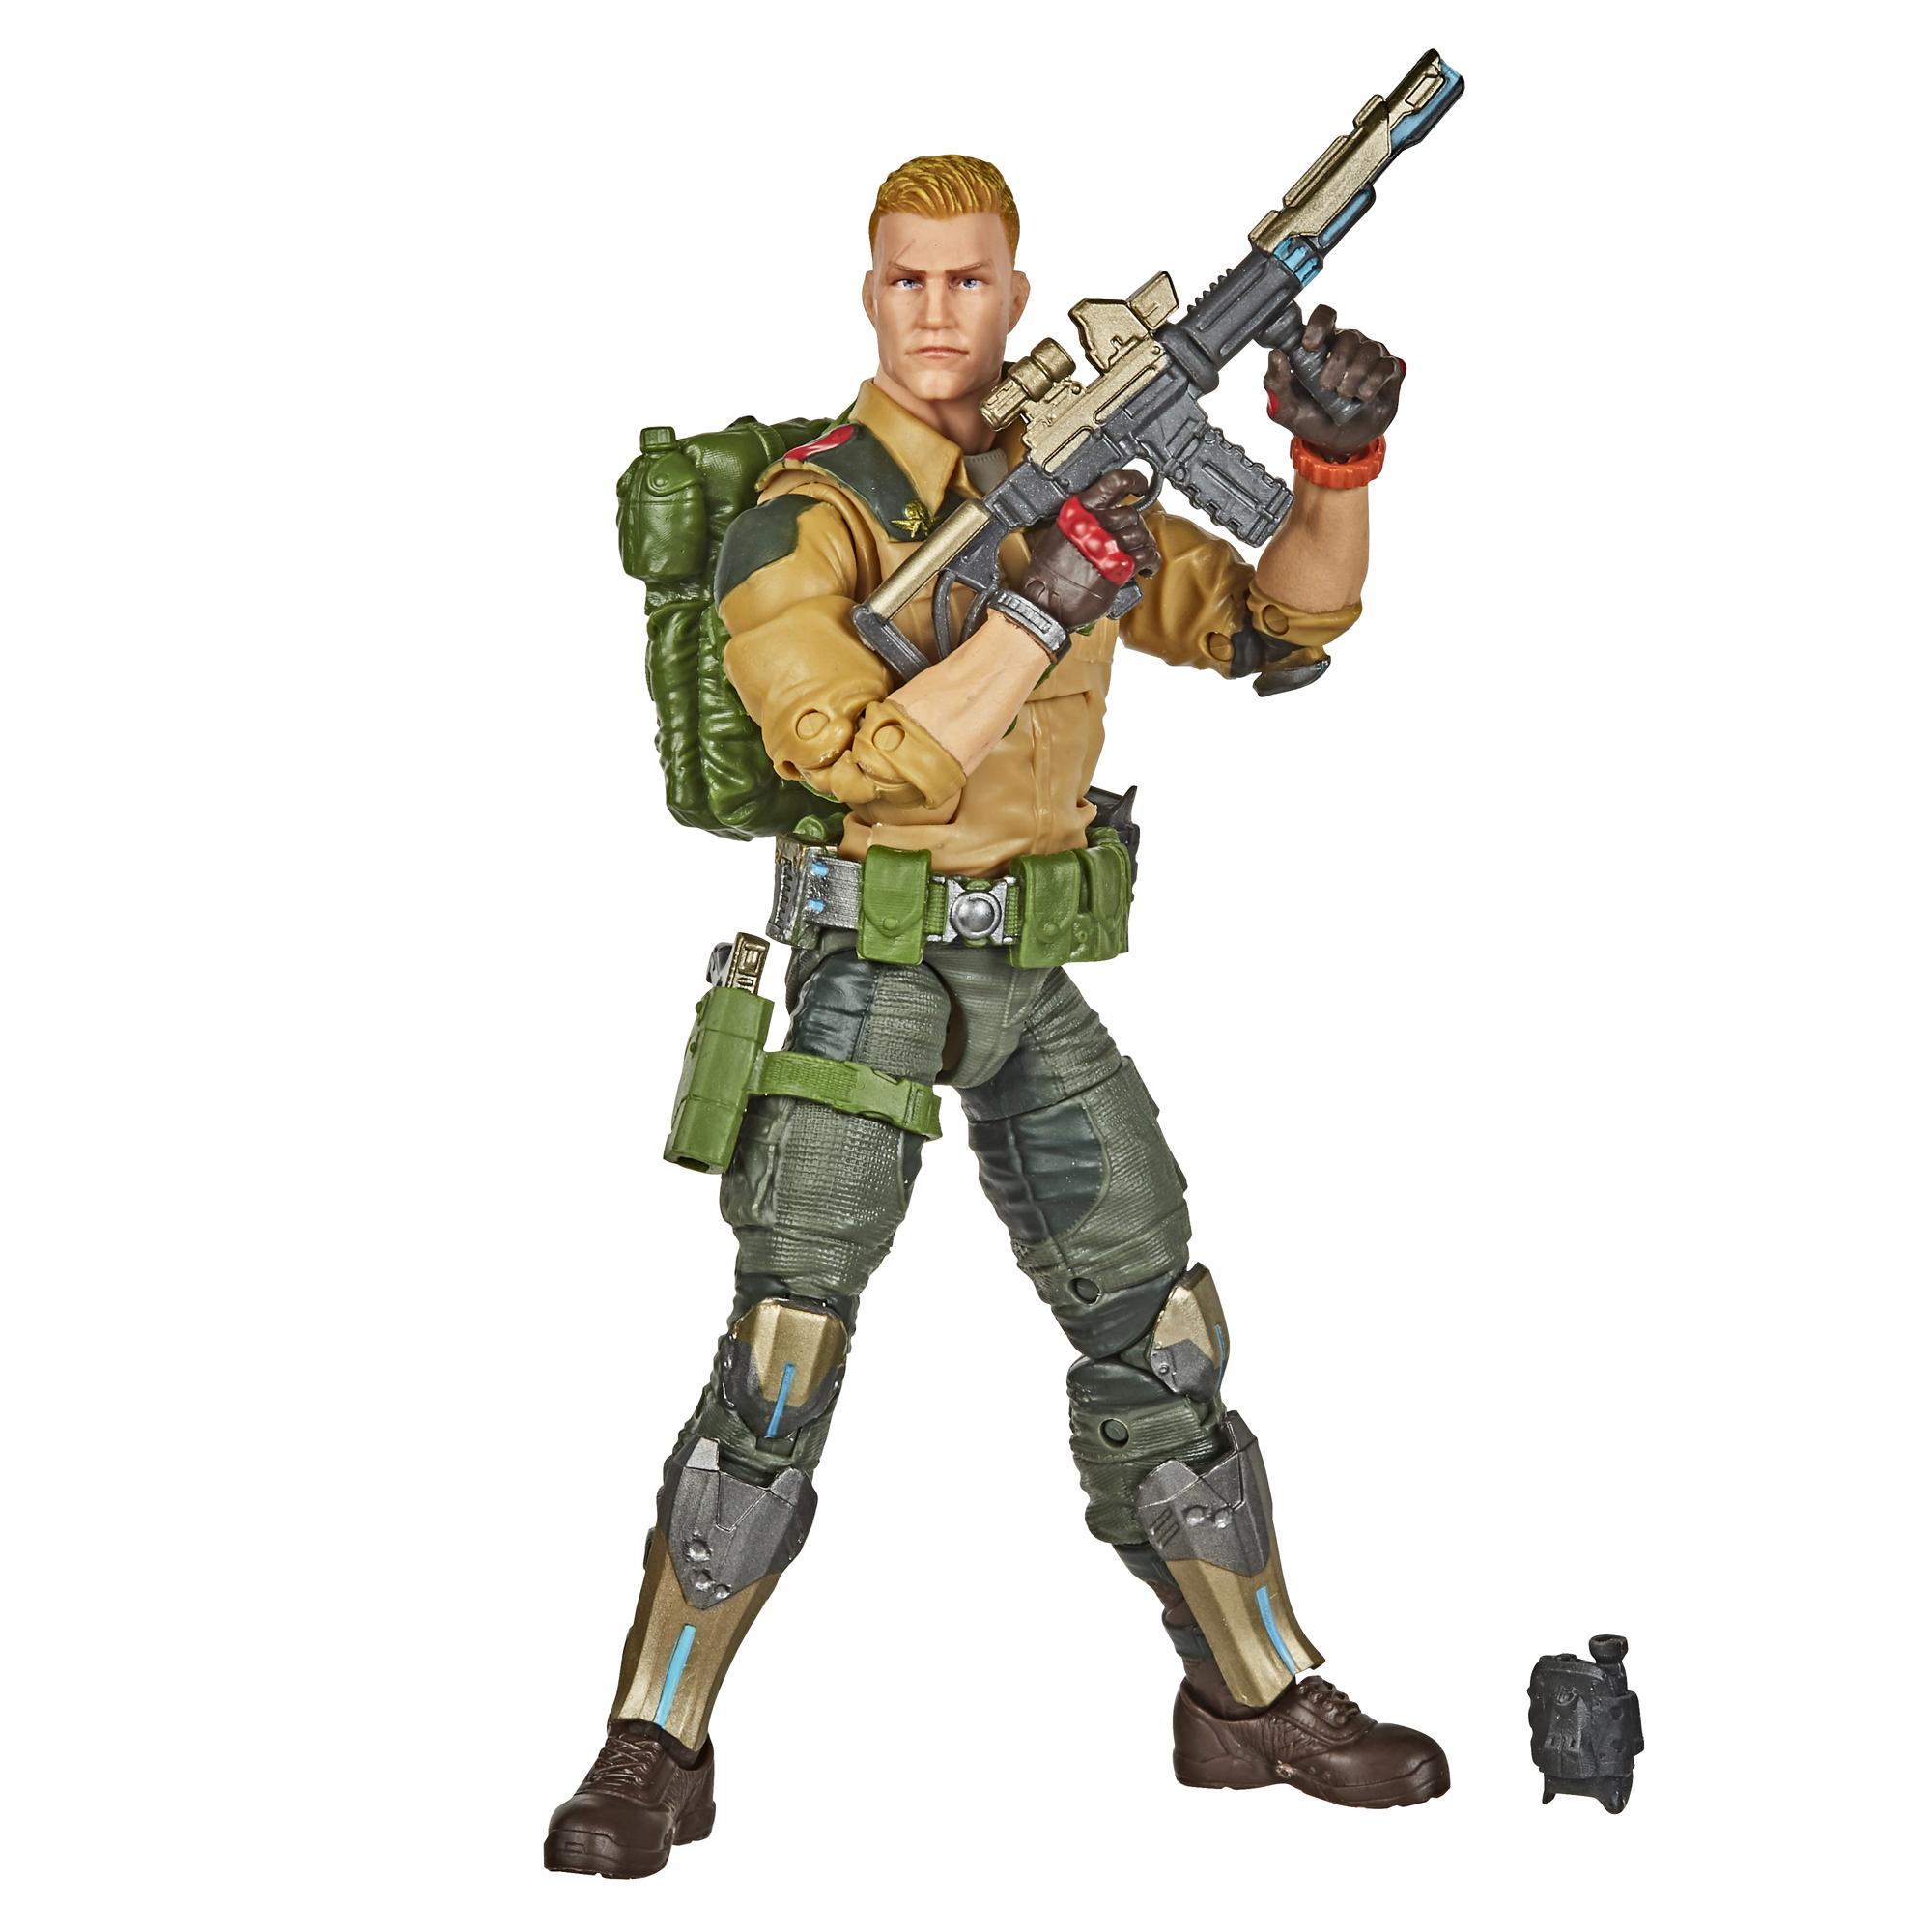 G.I. Joe Classified Series Duke Action-Figur